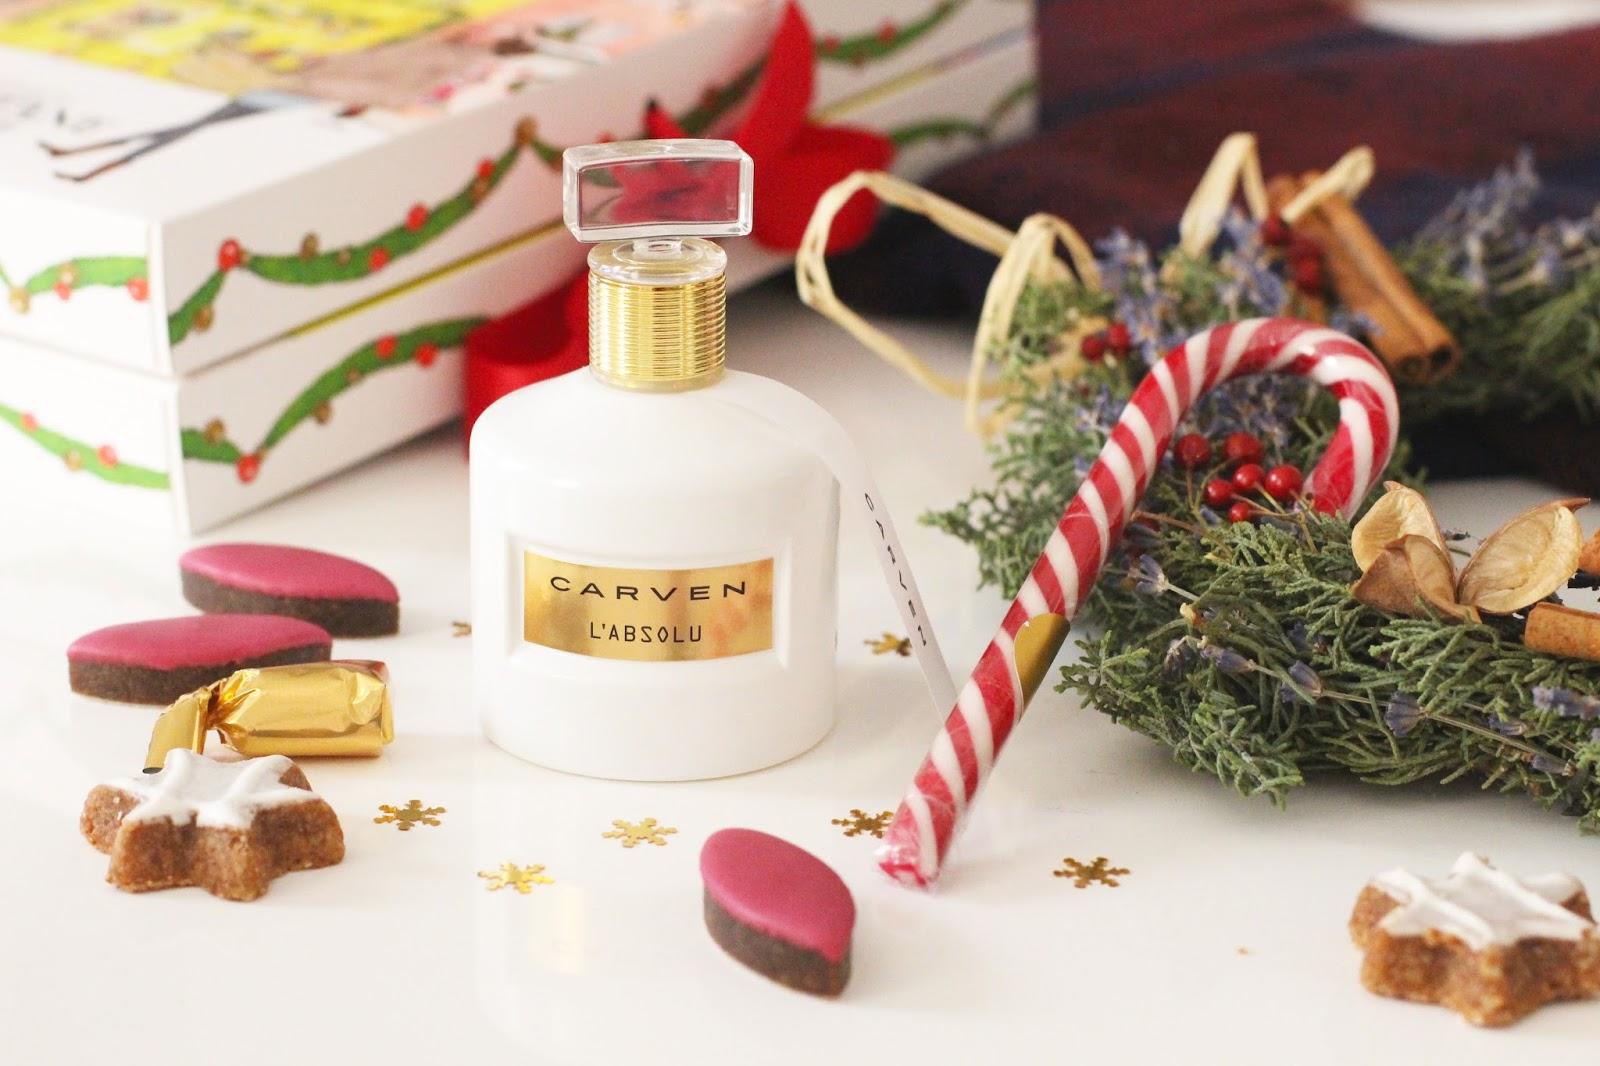 Parfum Carven L'Absolu